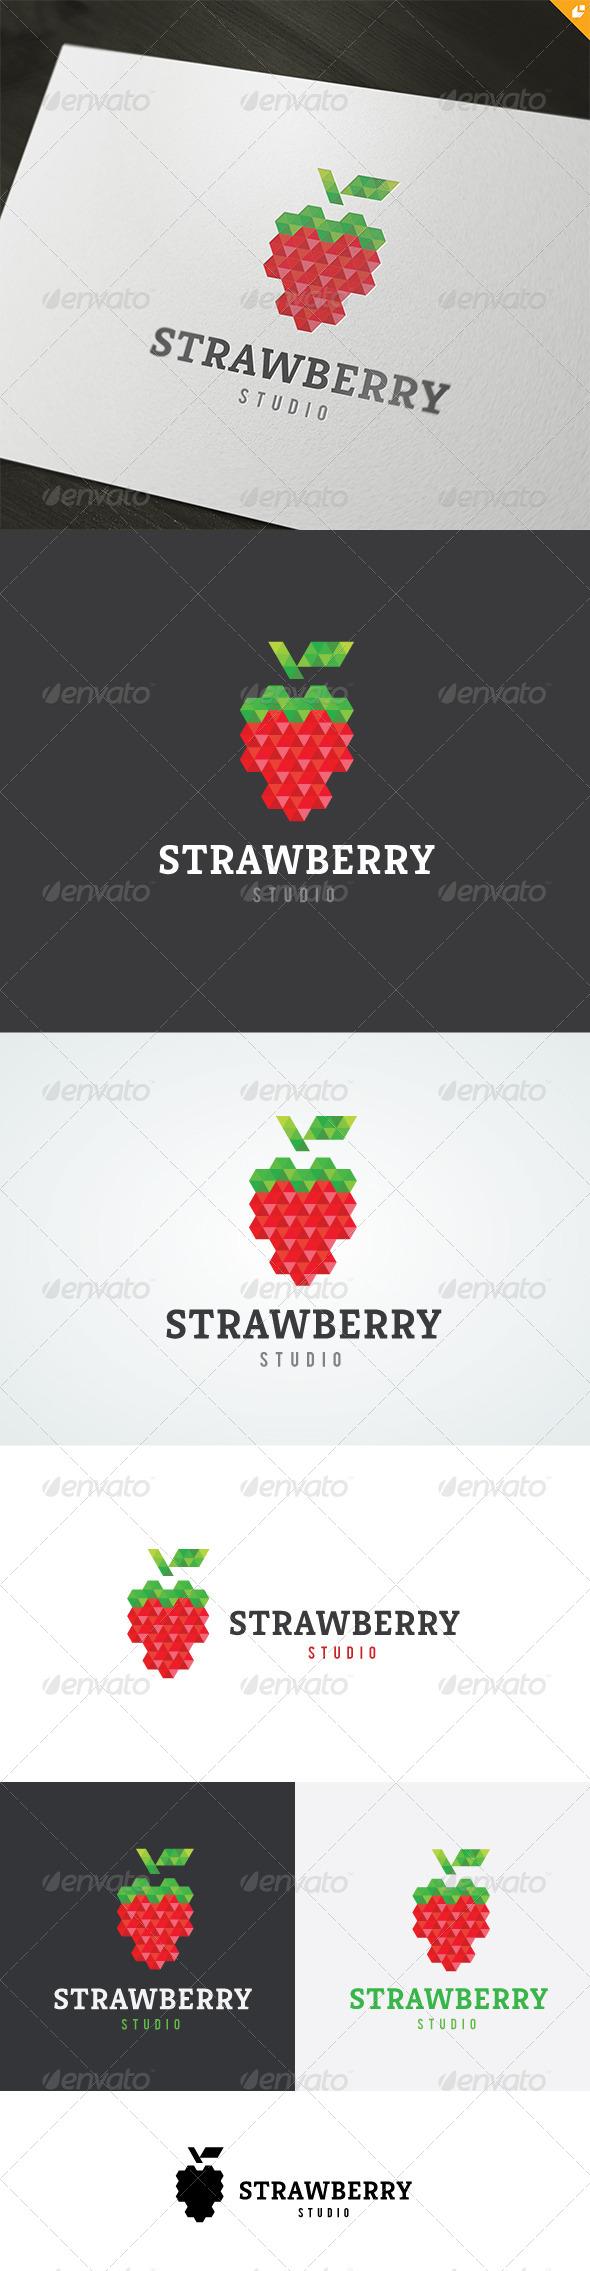 GraphicRiver Strawberry Studio Logo 4718499